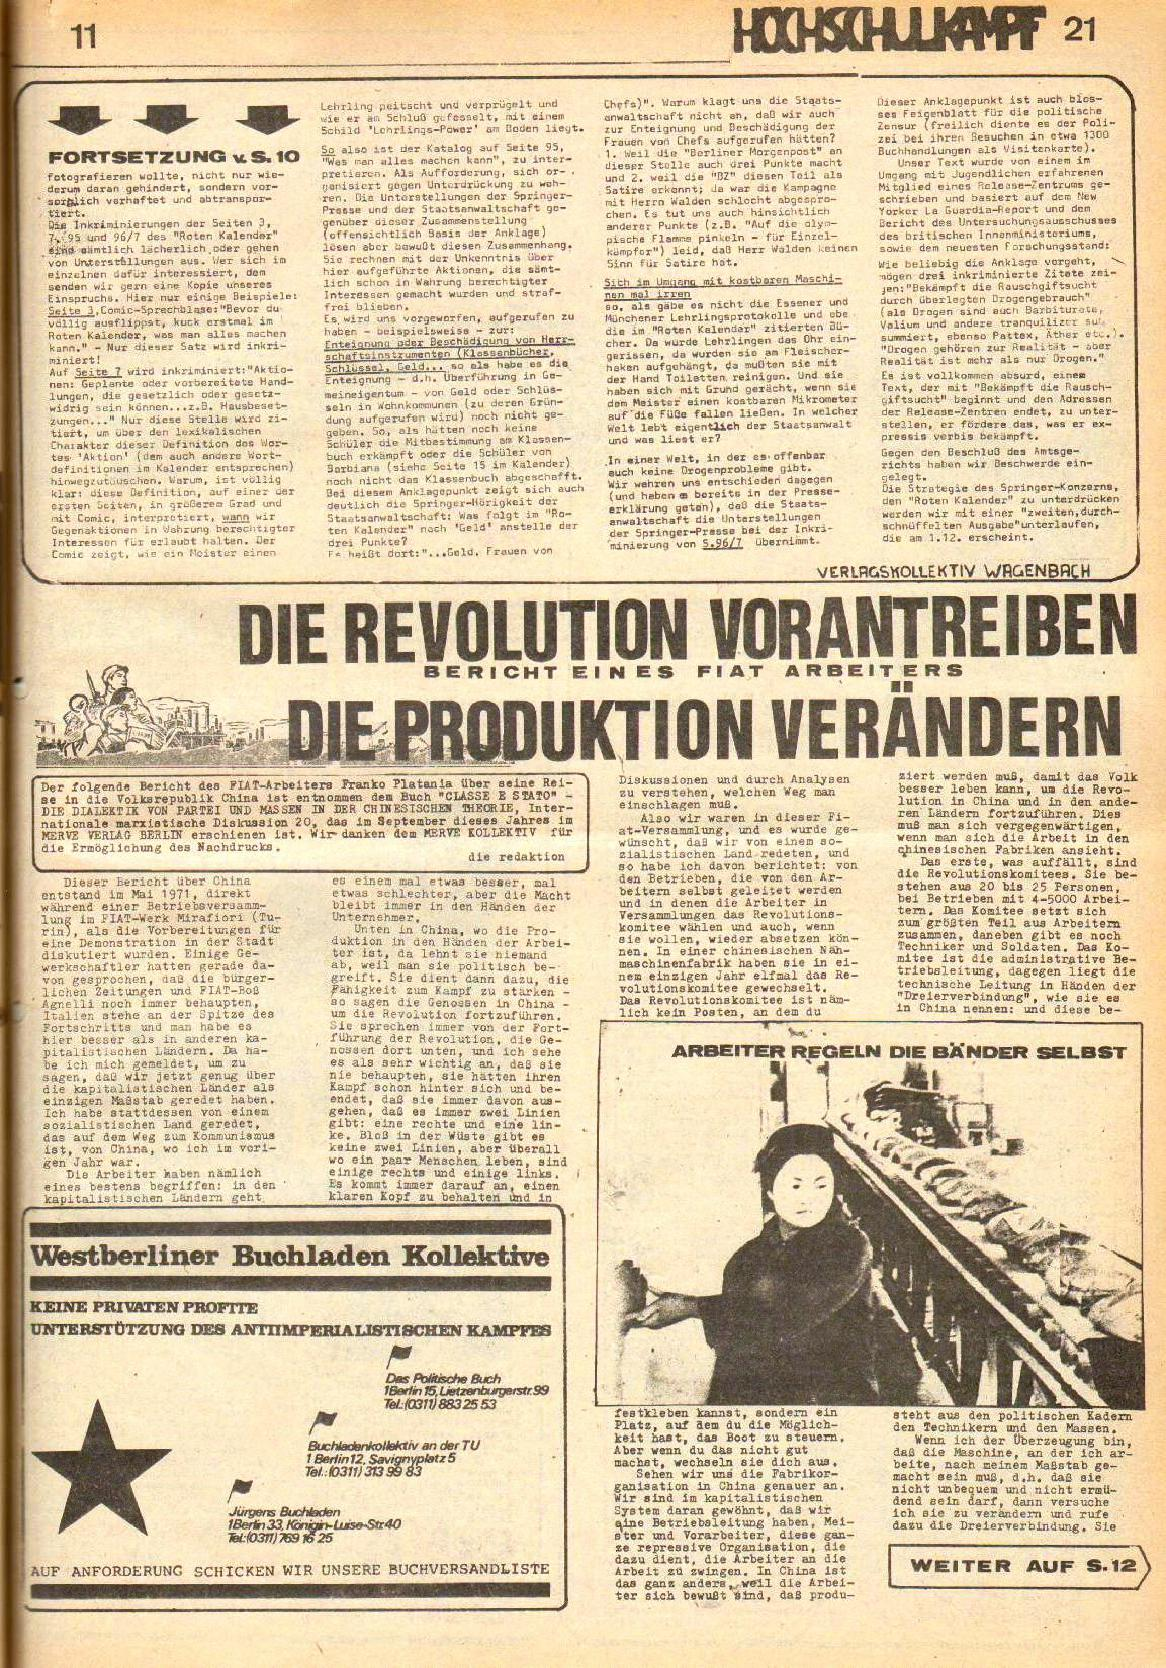 Berlin_Hochschulkampf_1971_21_13